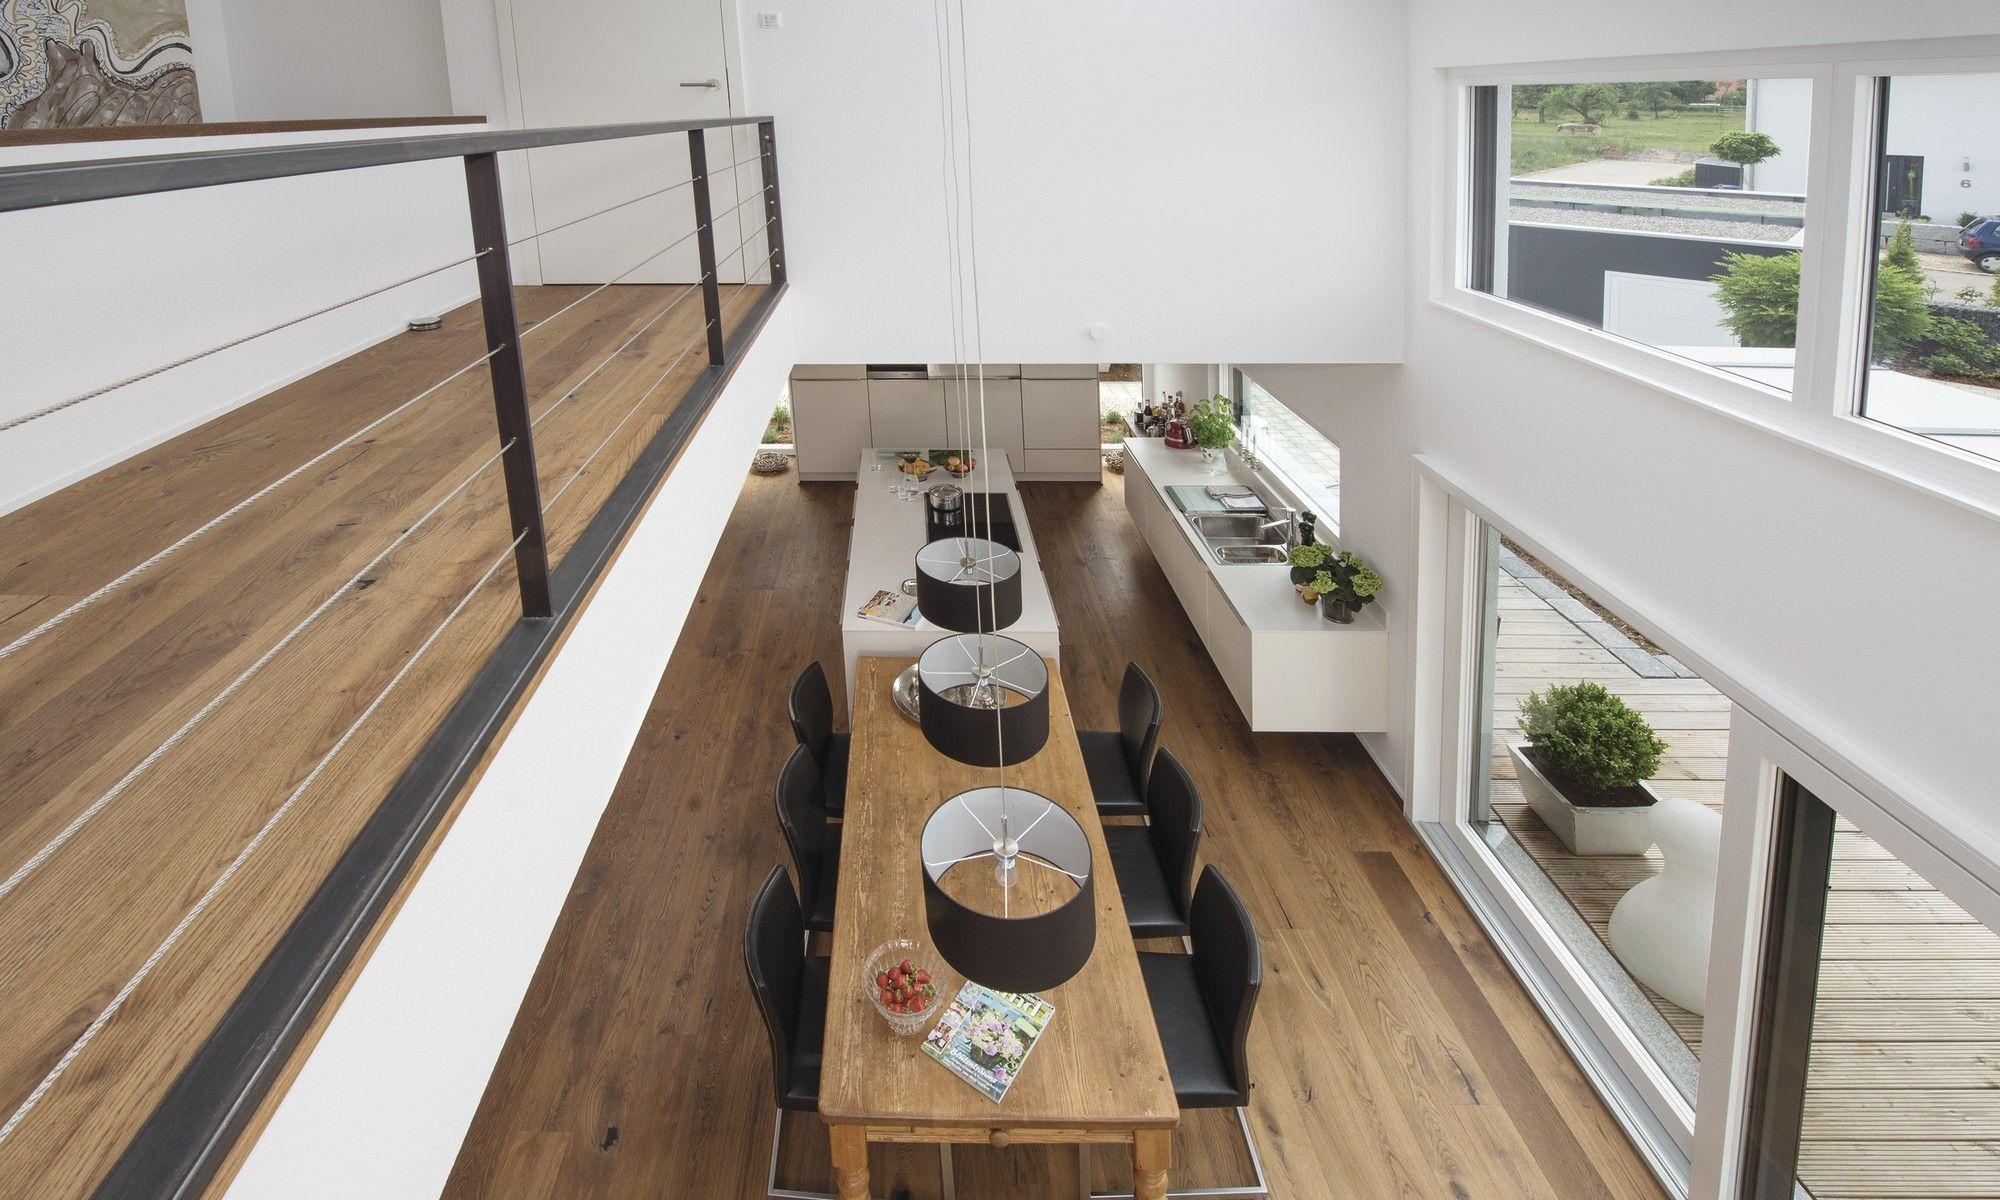 Modern Interieur Herenhuis : Hausdetailansicht bau huis interieur interieur